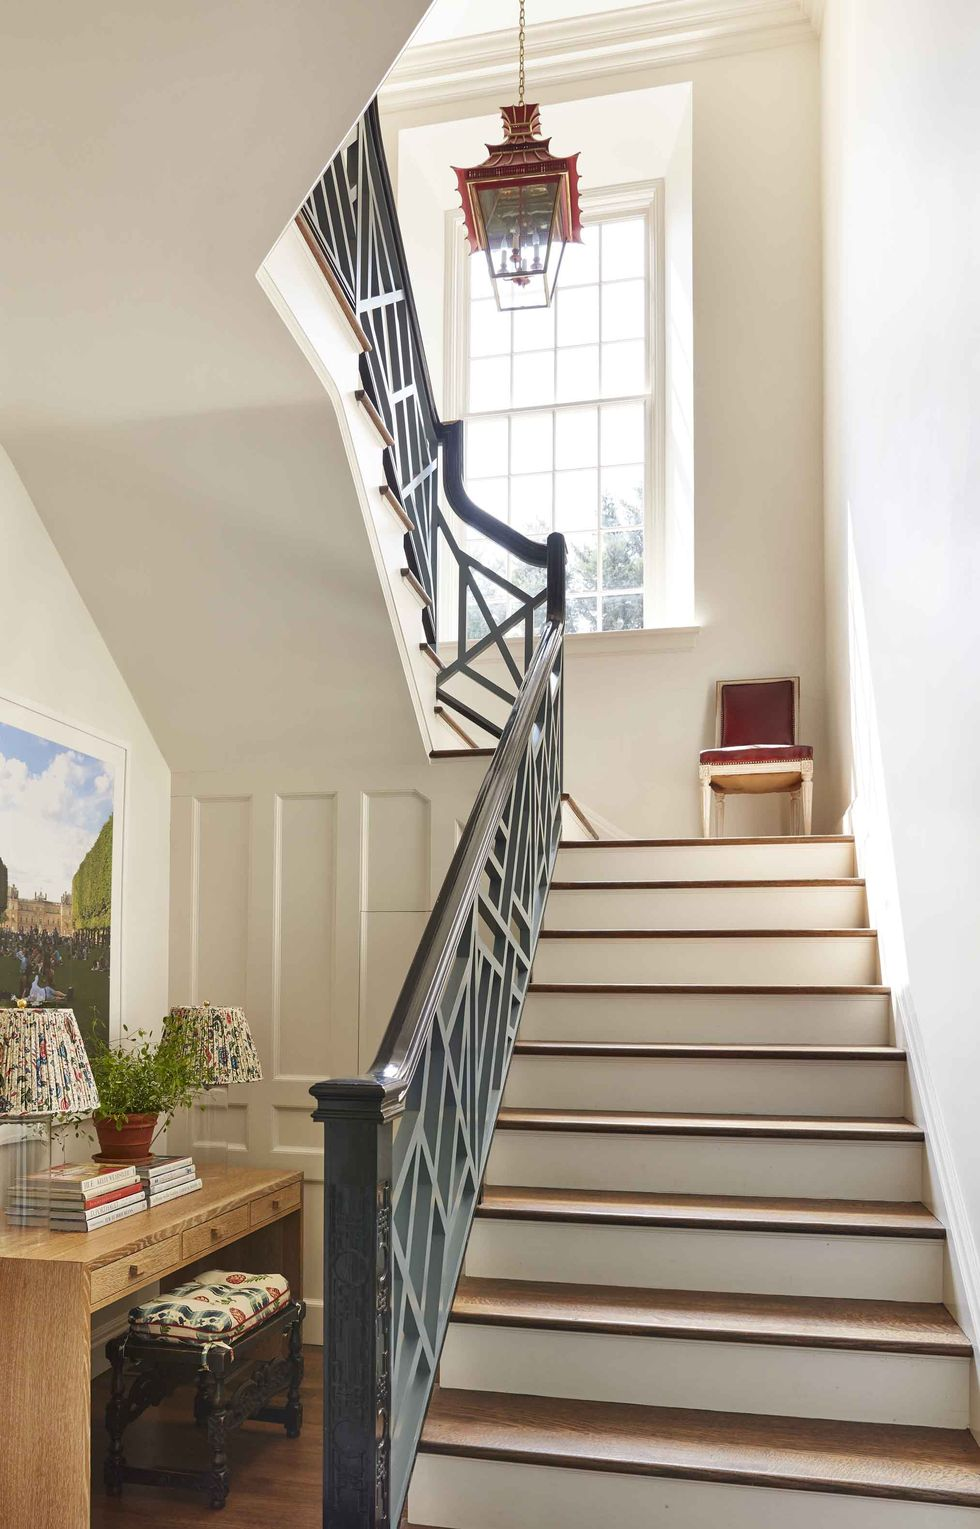 gidiere-stairway-alabama-veranda-1